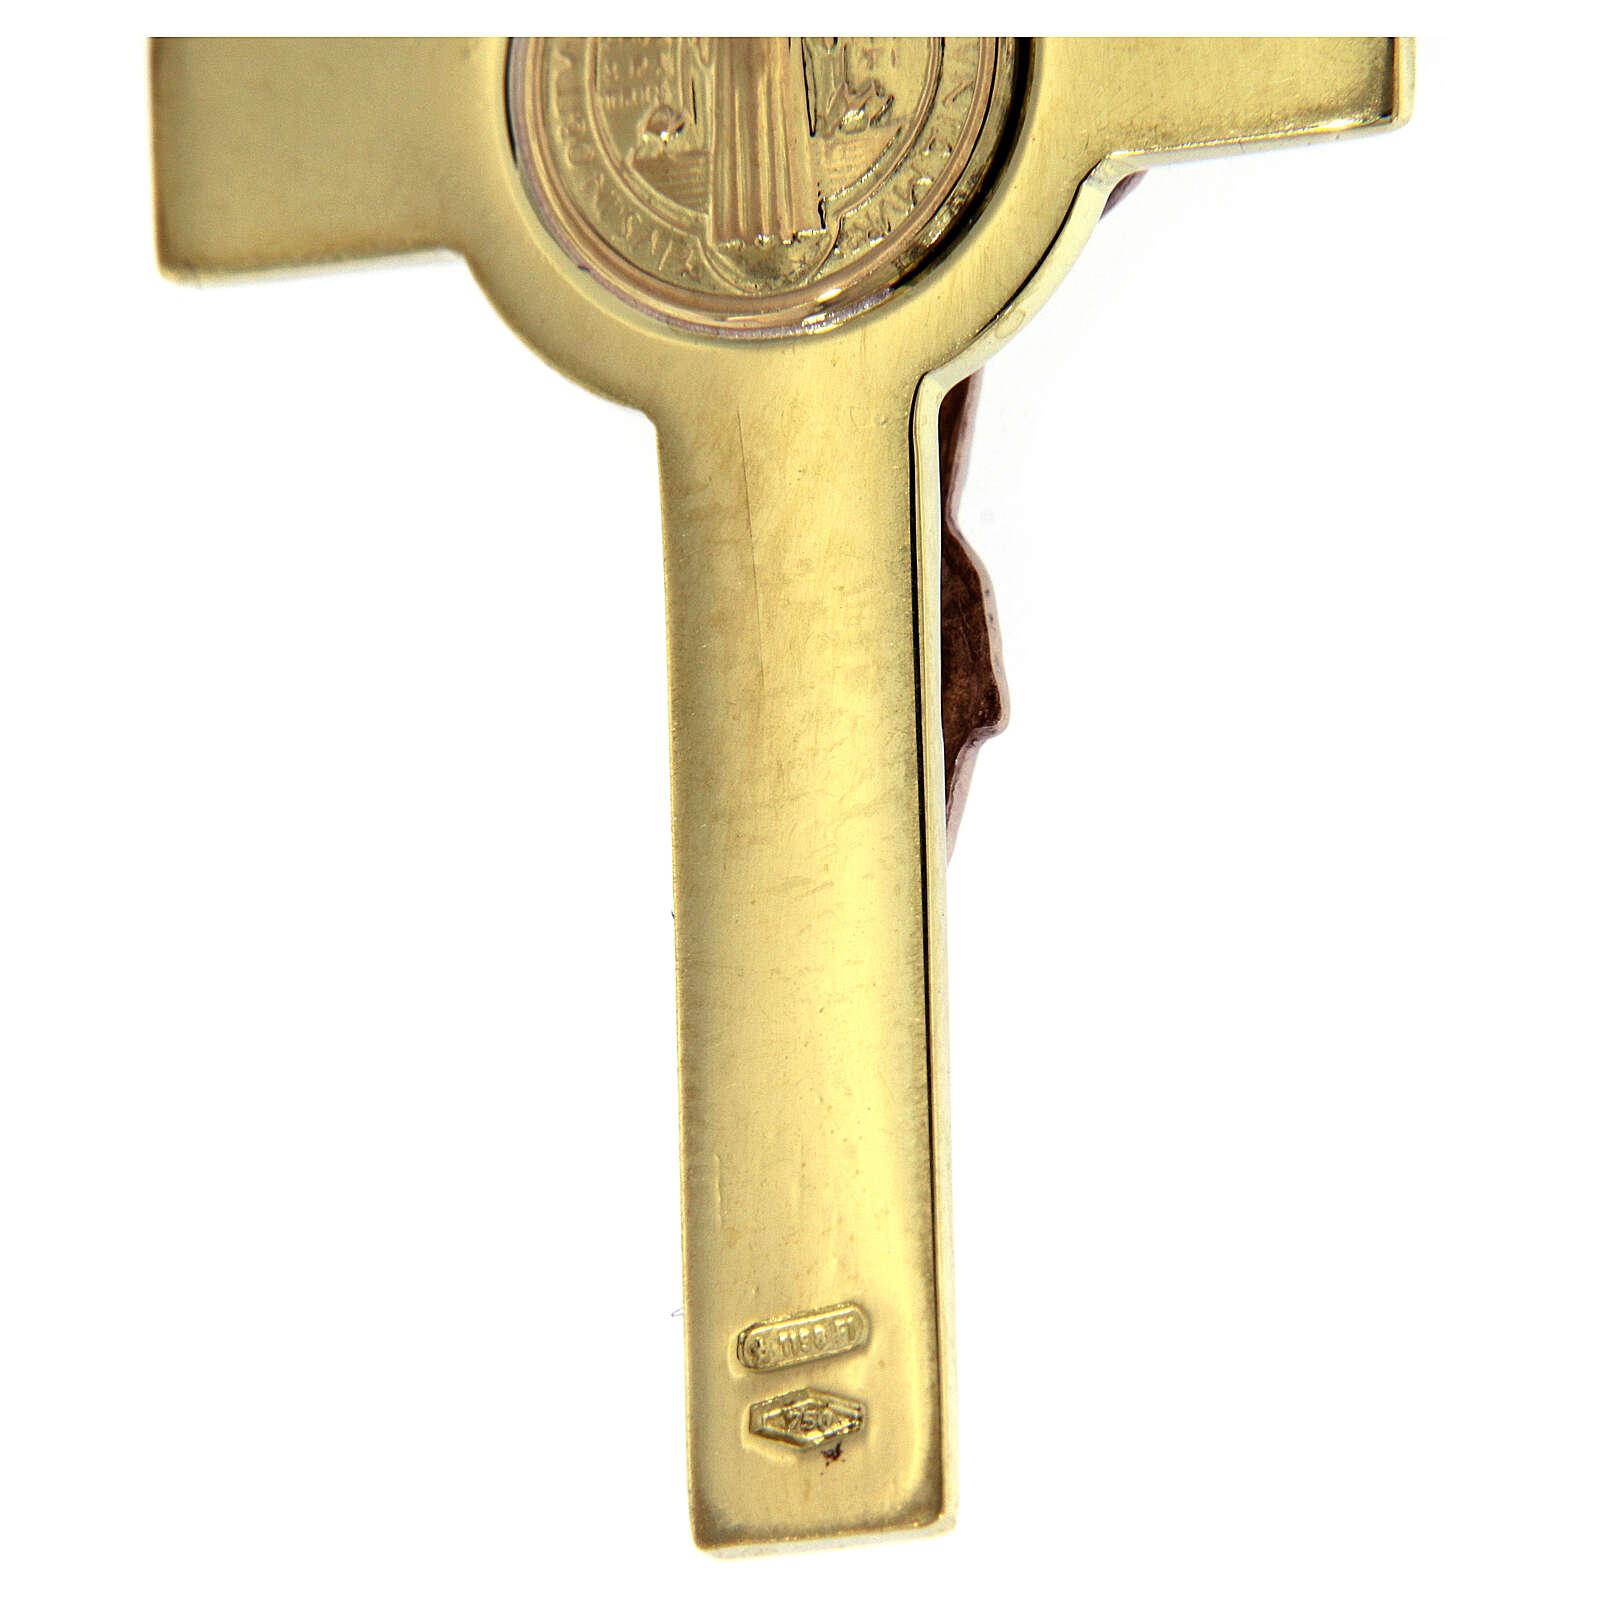 Croix de St. Benoît pendentif or et diamant 4